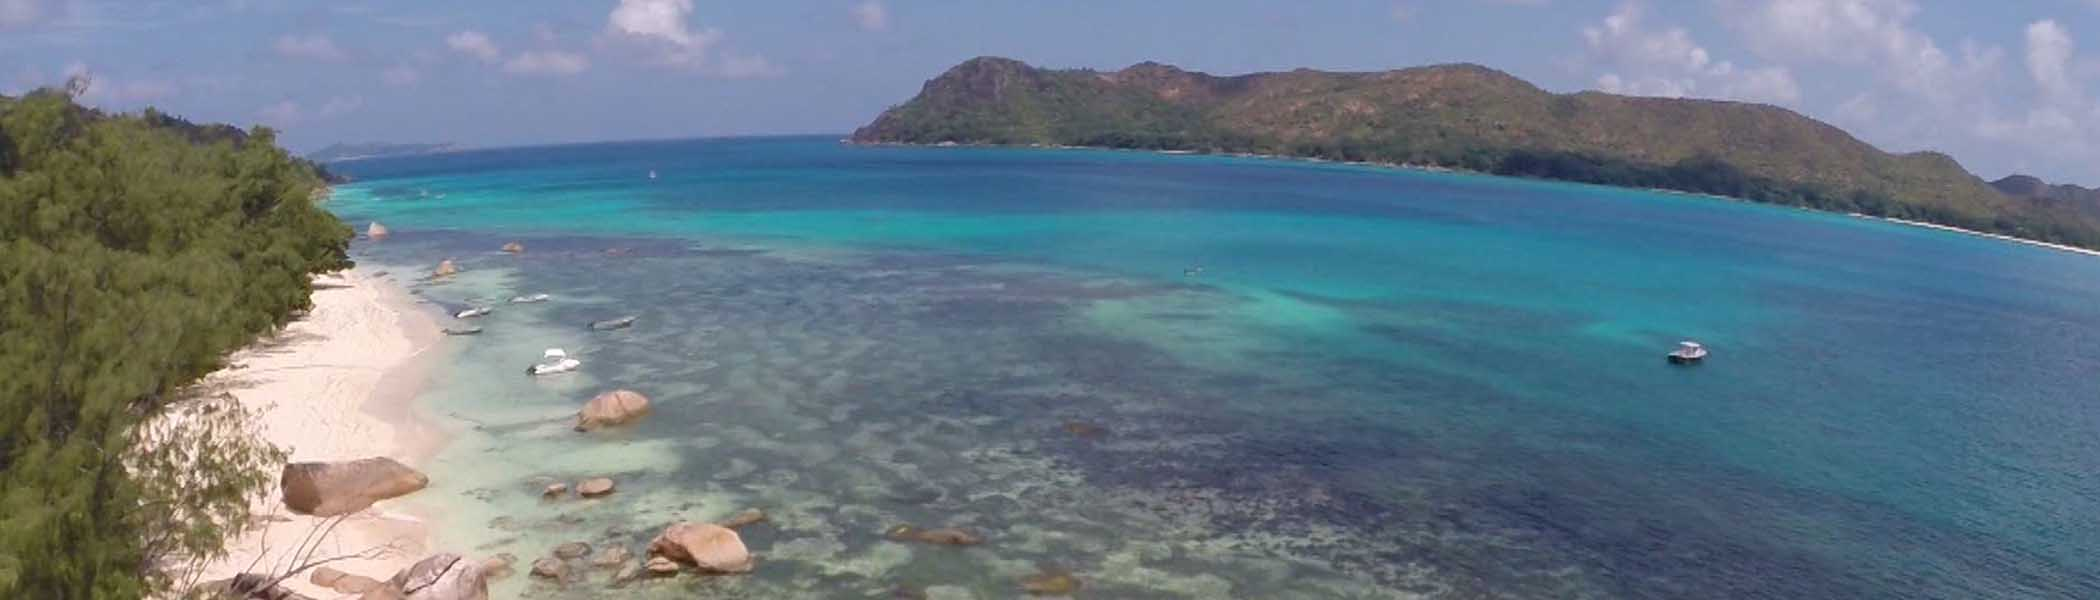 anse-boudin, Beaches in Seychelles Islands